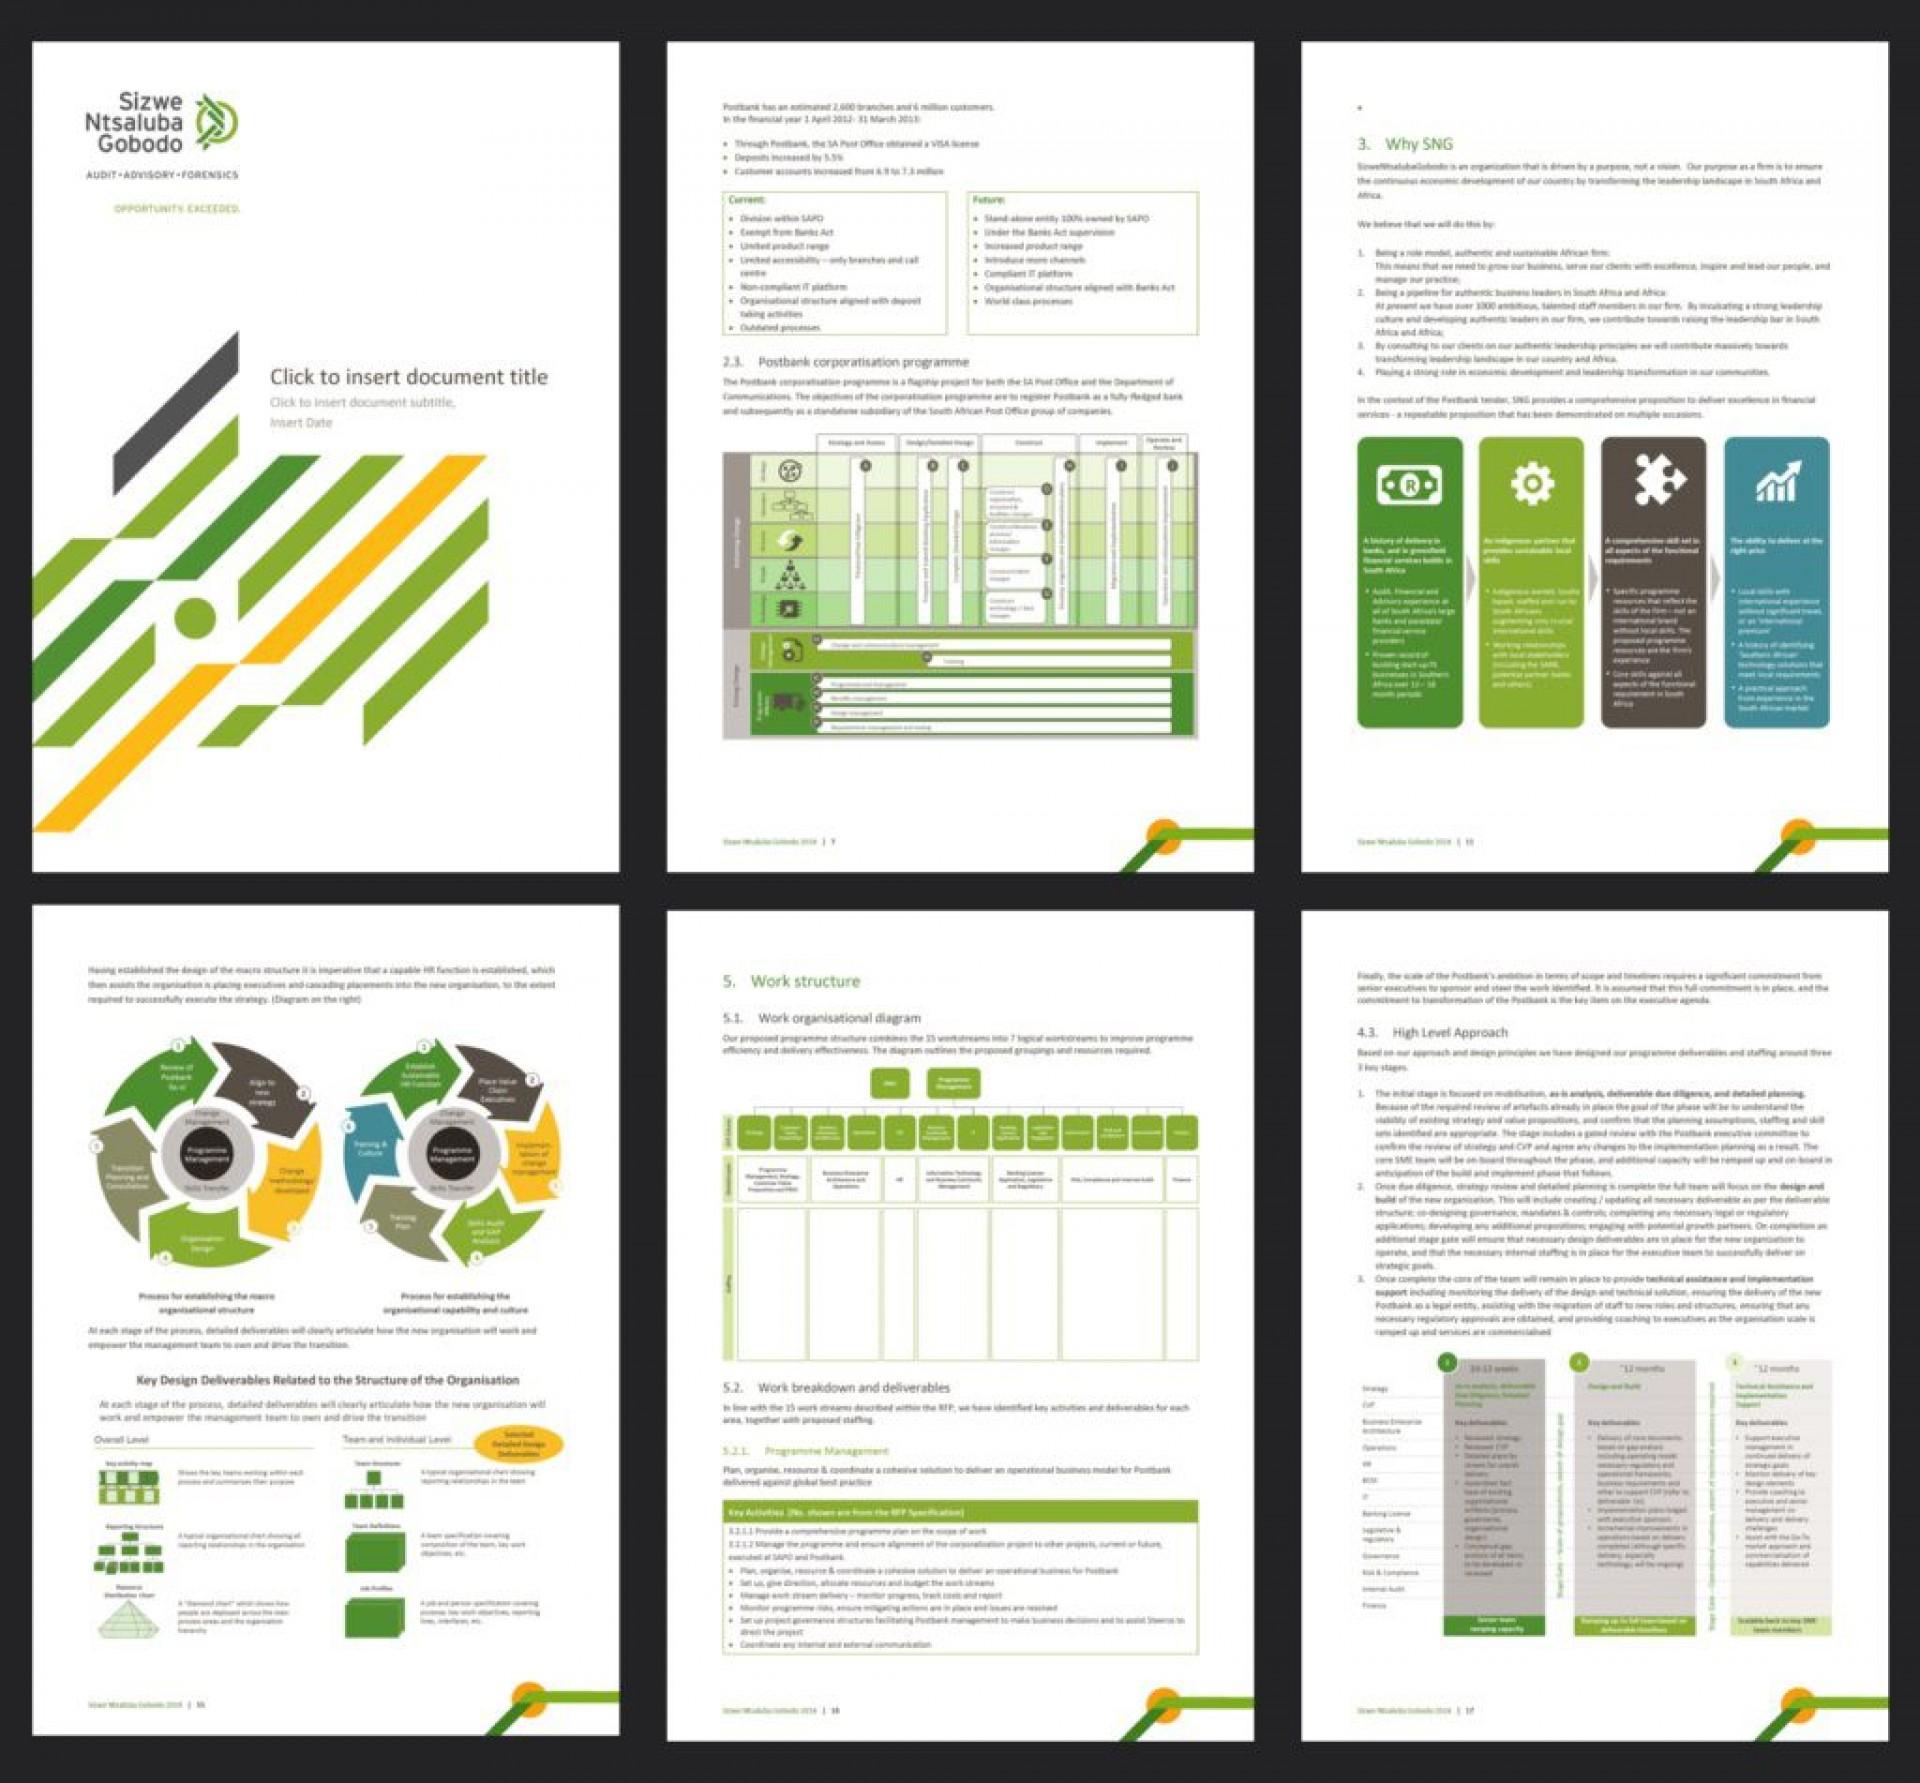 007 Best Microsoft Word Design Template Image  Templates Brochure Free M1920